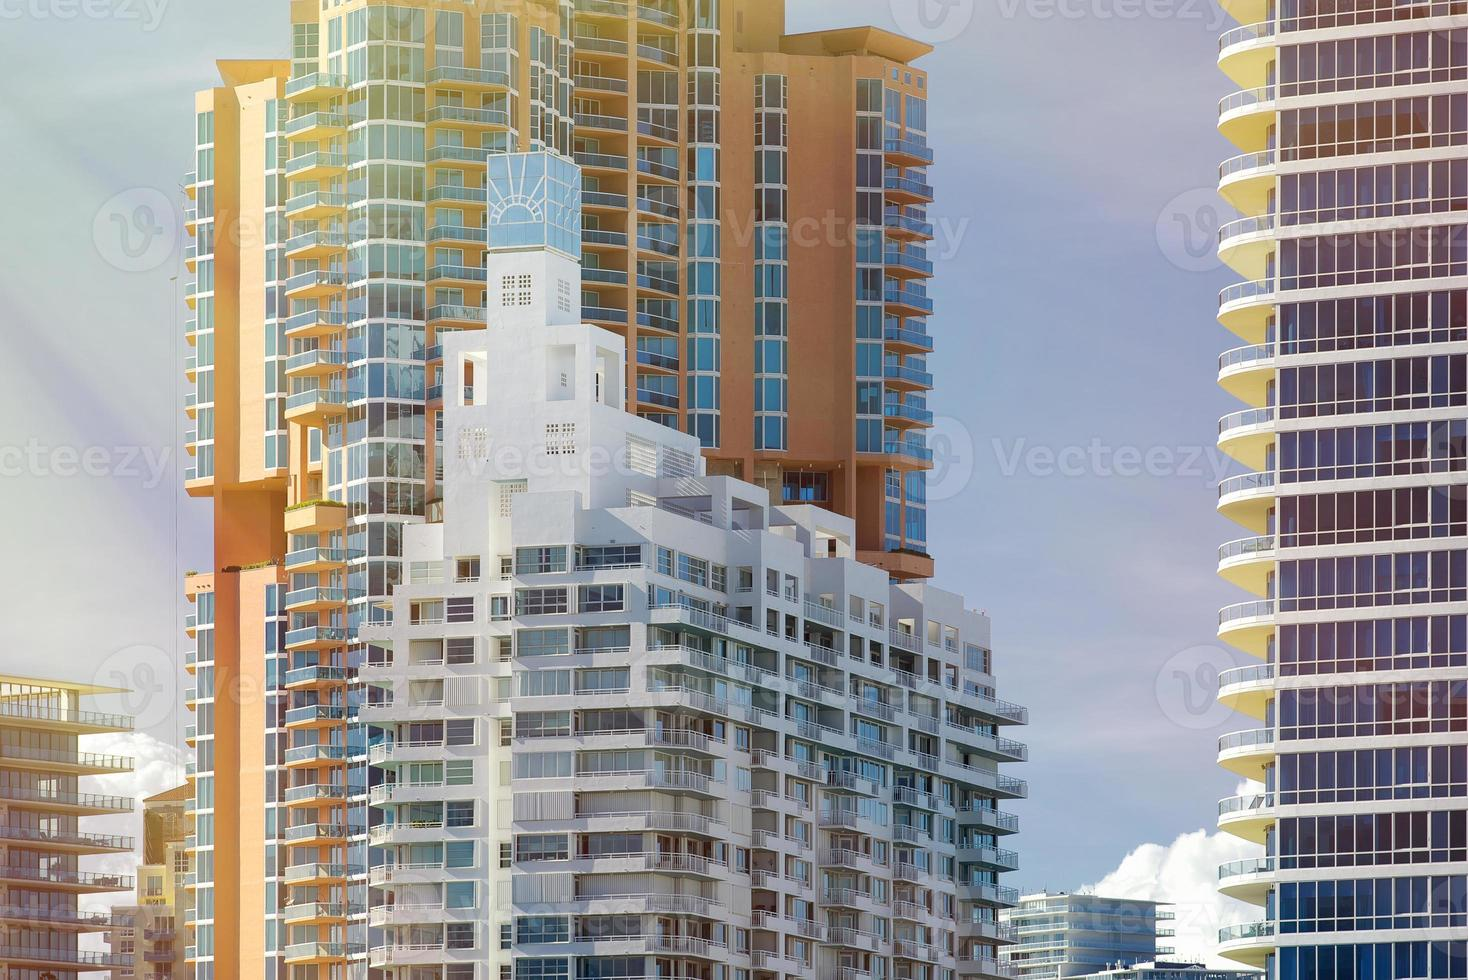 Miami South Beach-architectuur foto